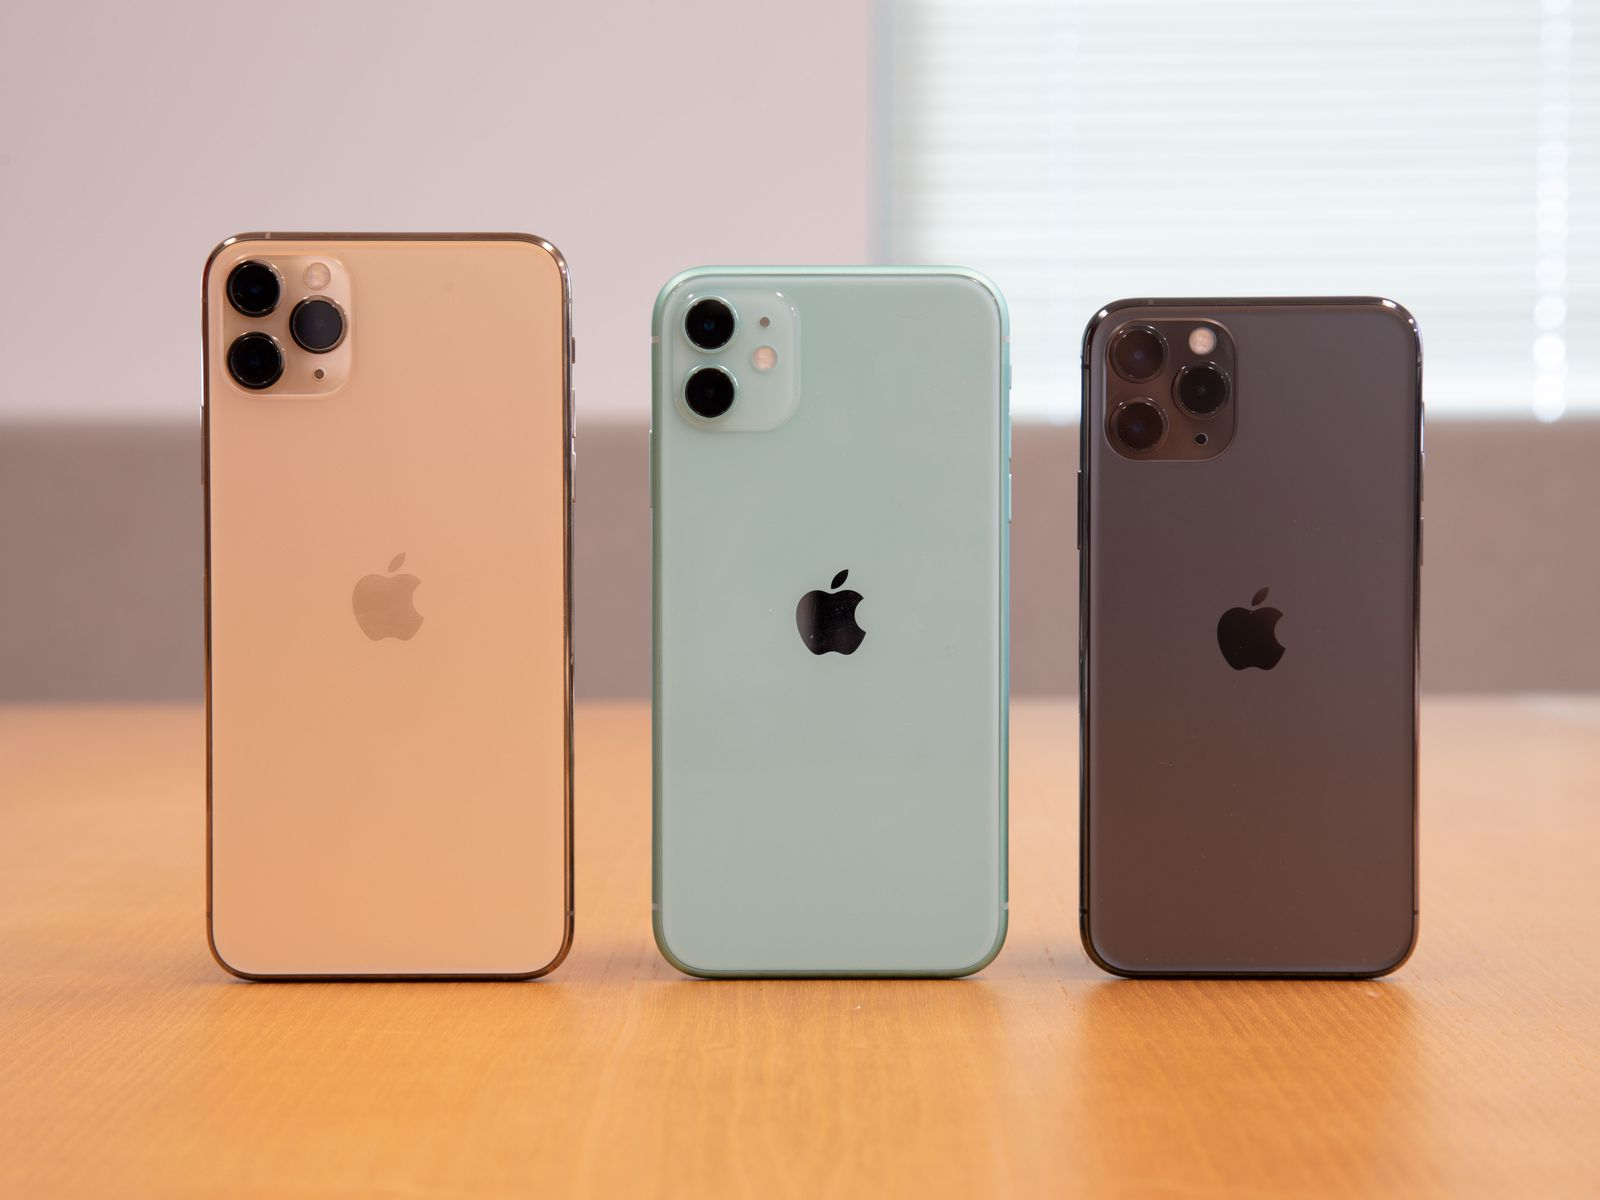 iPhone 11 系列需求創新高 大陸市場銷售急增 230%   香港 unwire.hk 玩生活.樂科技